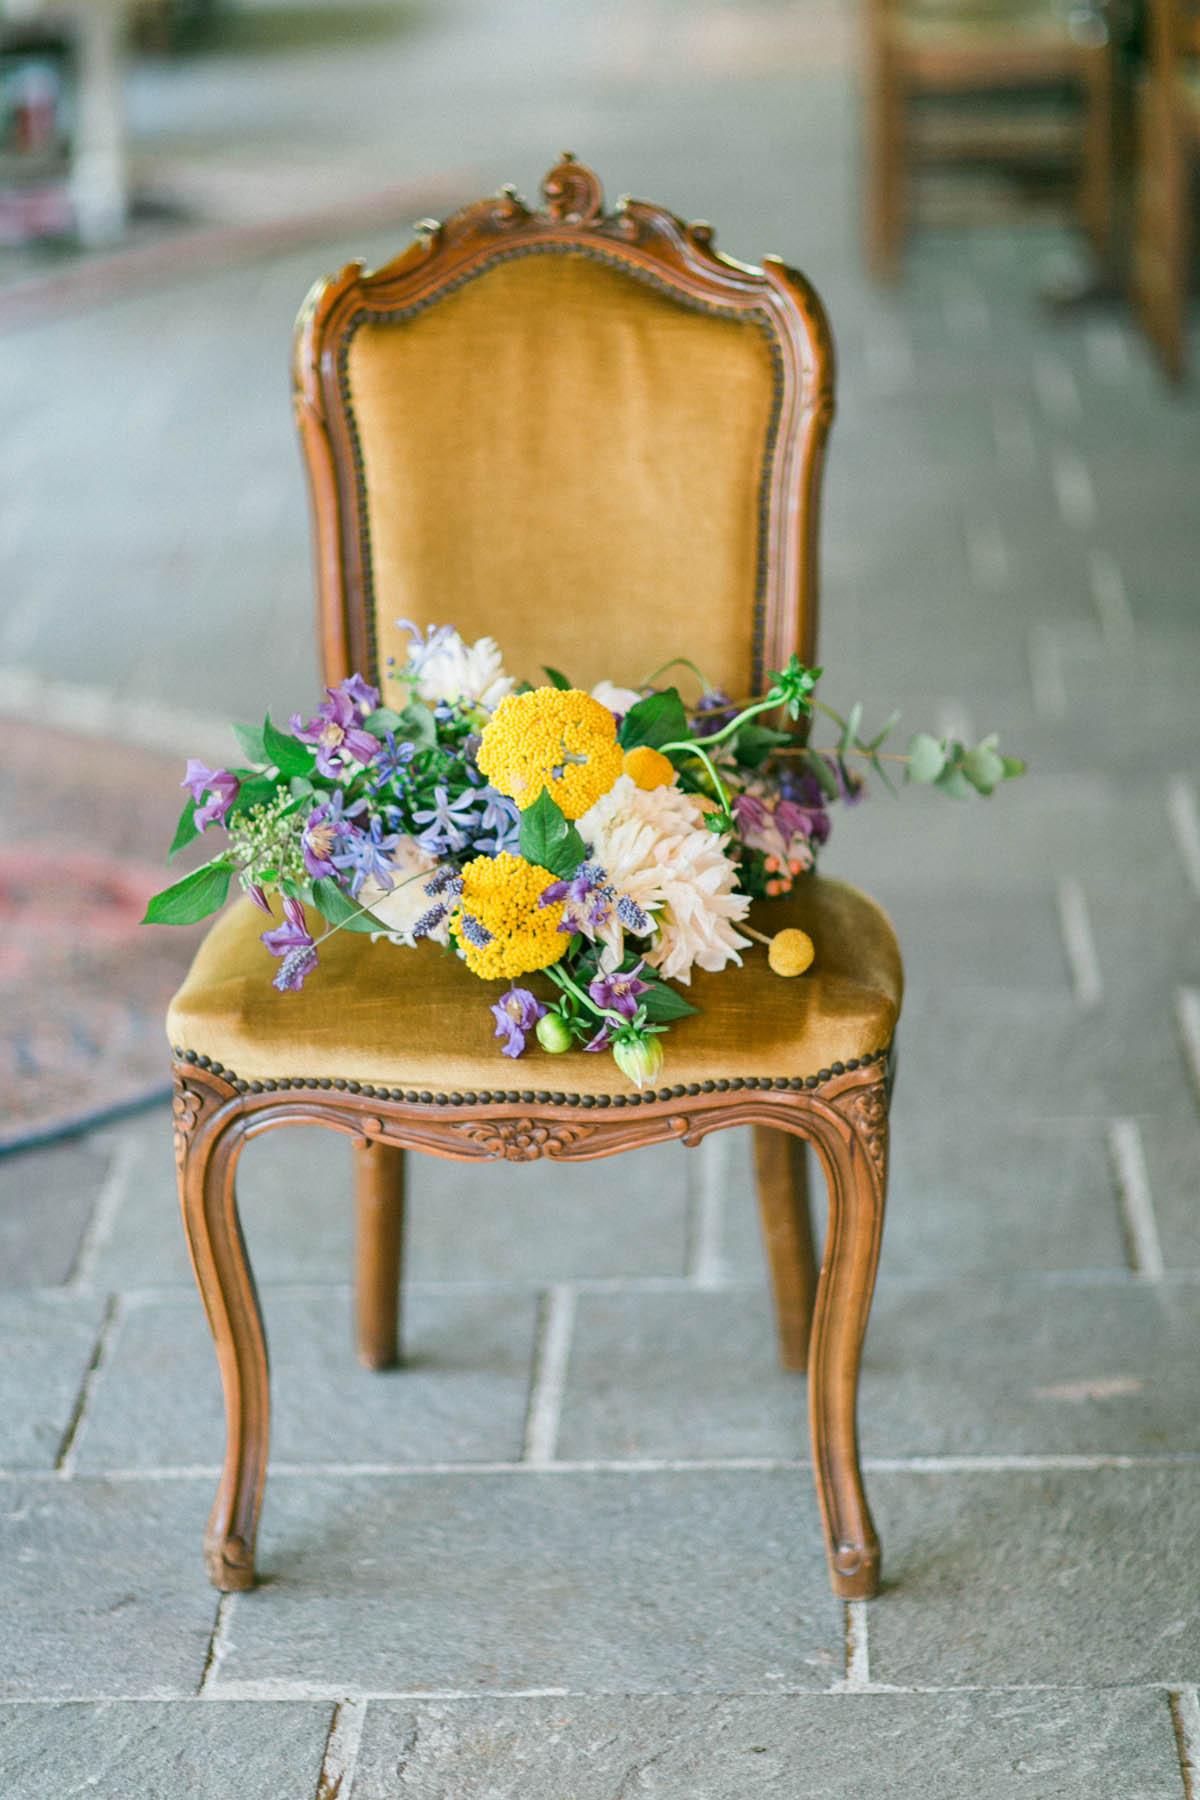 bouquet giallo e lilla